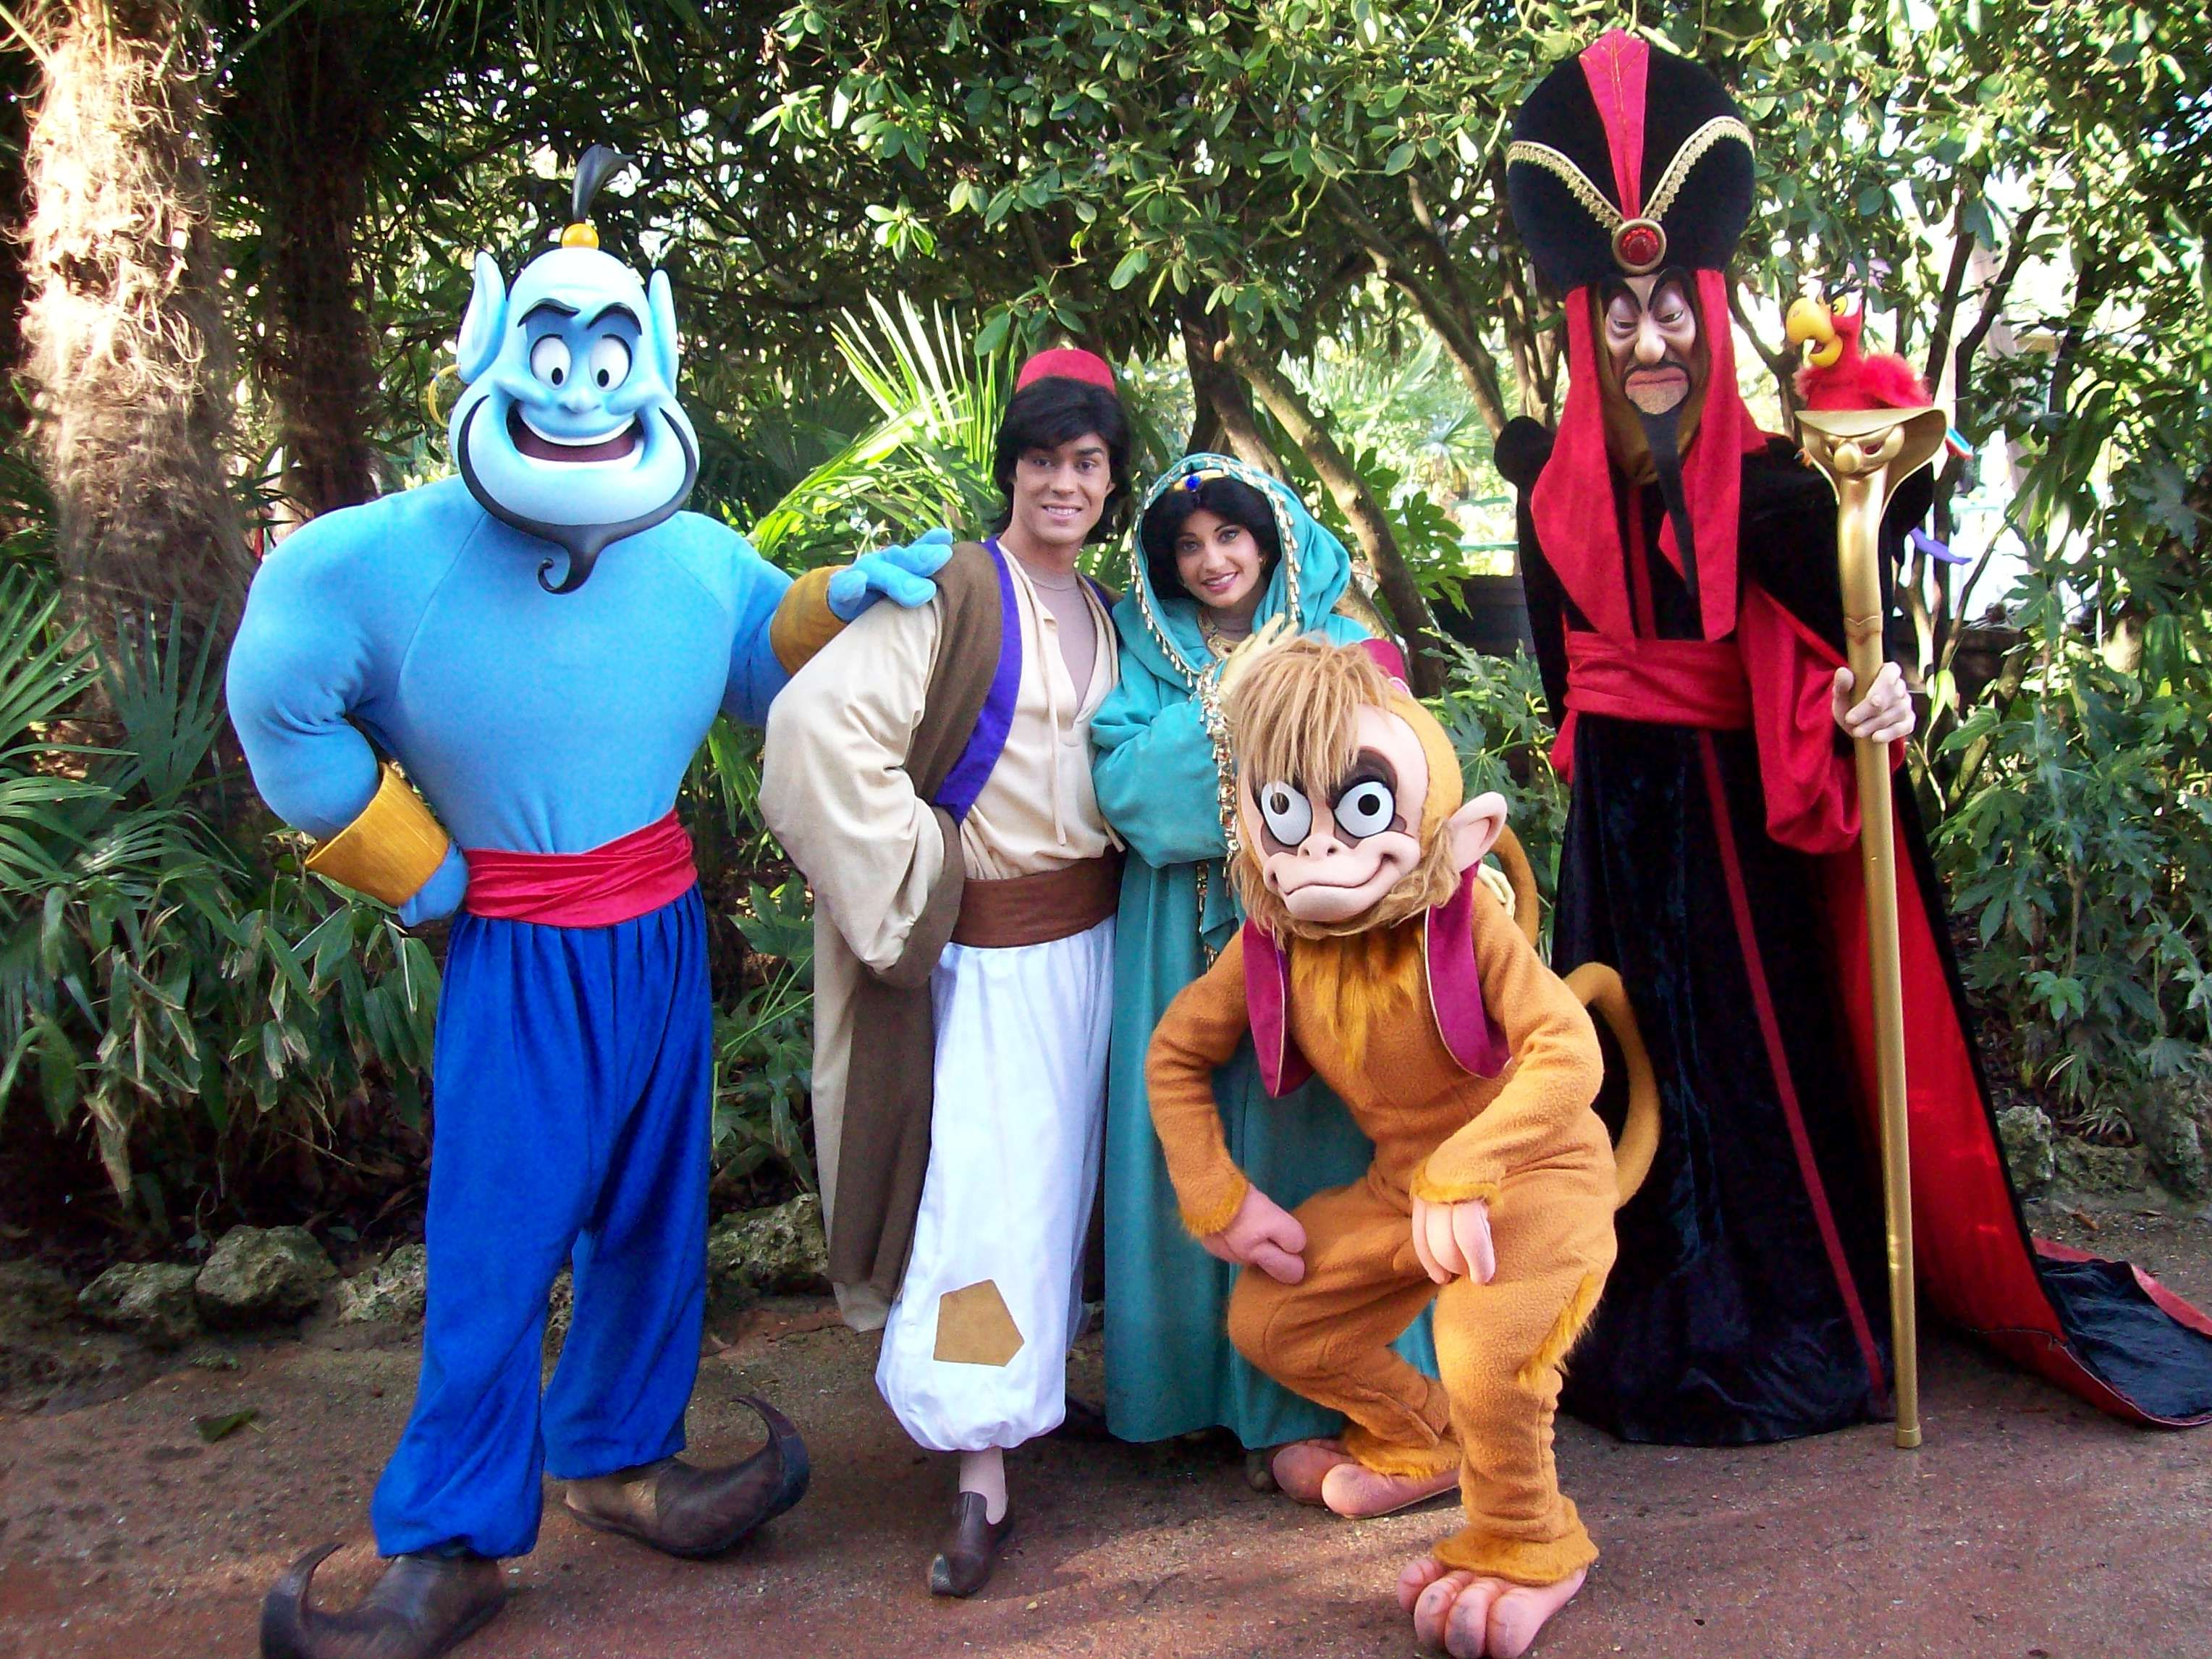 Genie Aladdin Jasmine Abu And Jafar Various Disney Some Dark